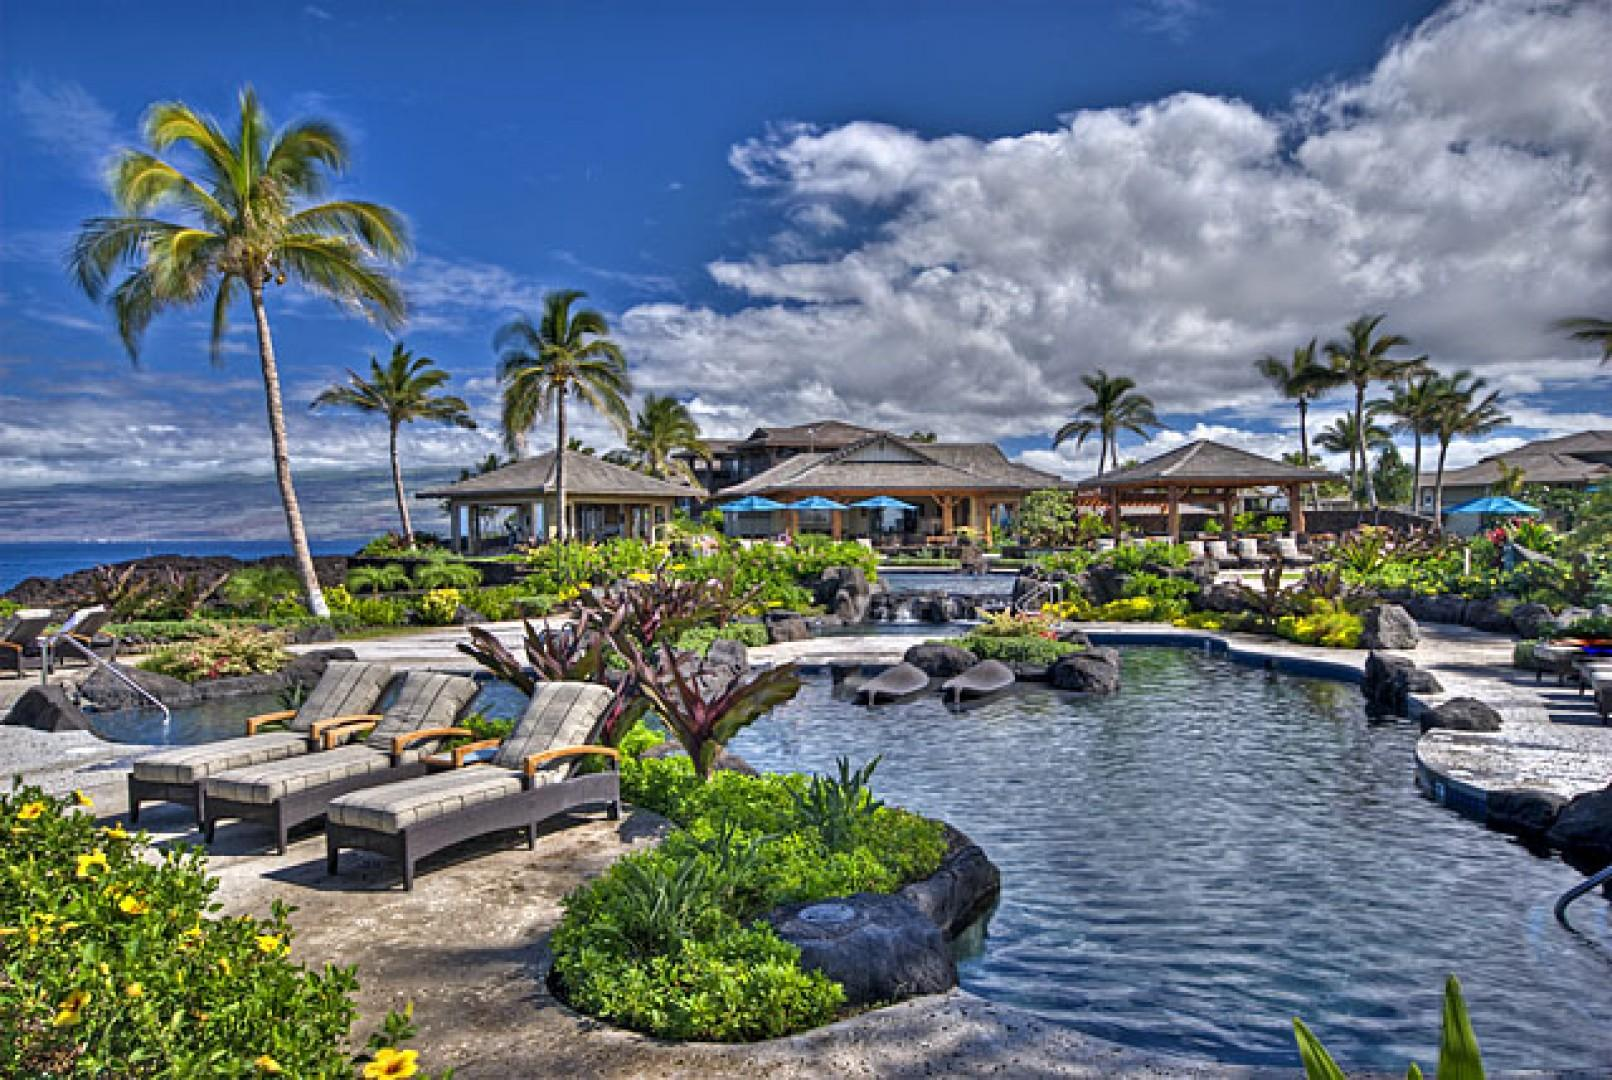 Hali'i Kai pool and cabana.